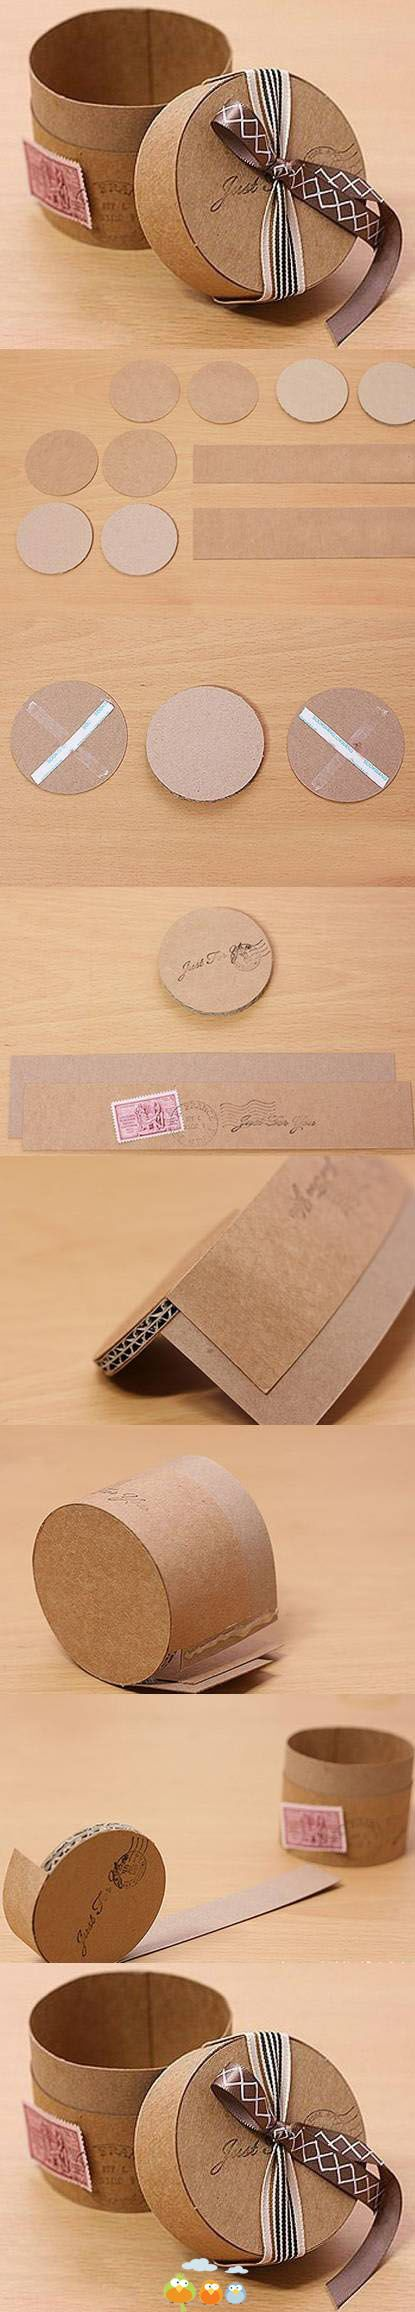 DIY Cute Cardboard Gift Box (DIY Creative Ideas)                                                                                                                                                                                 More